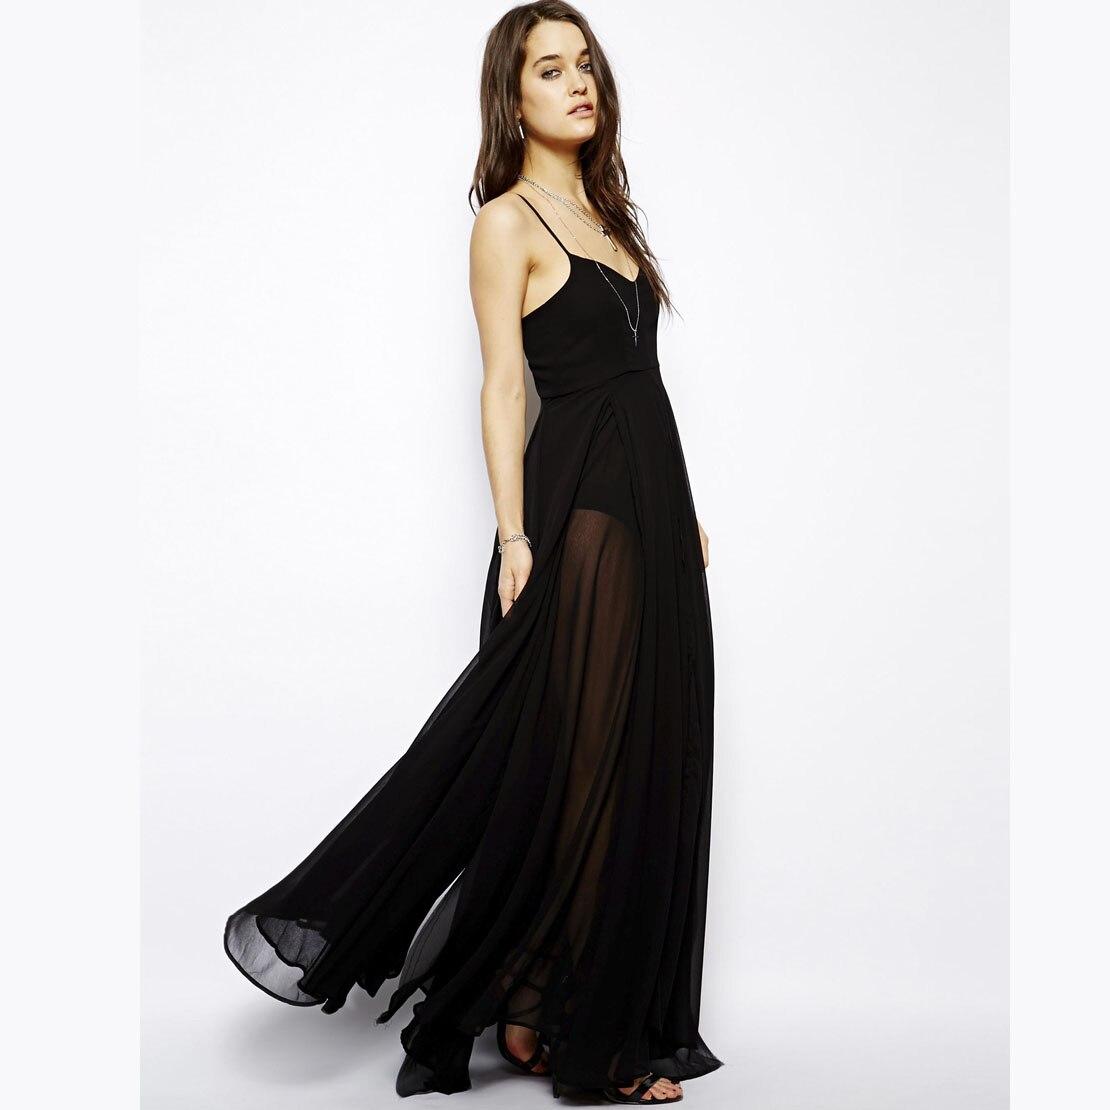 7706608bfe Black spaghetti strap dress perspectivity lining long design Floor-length  dress one-piece dress